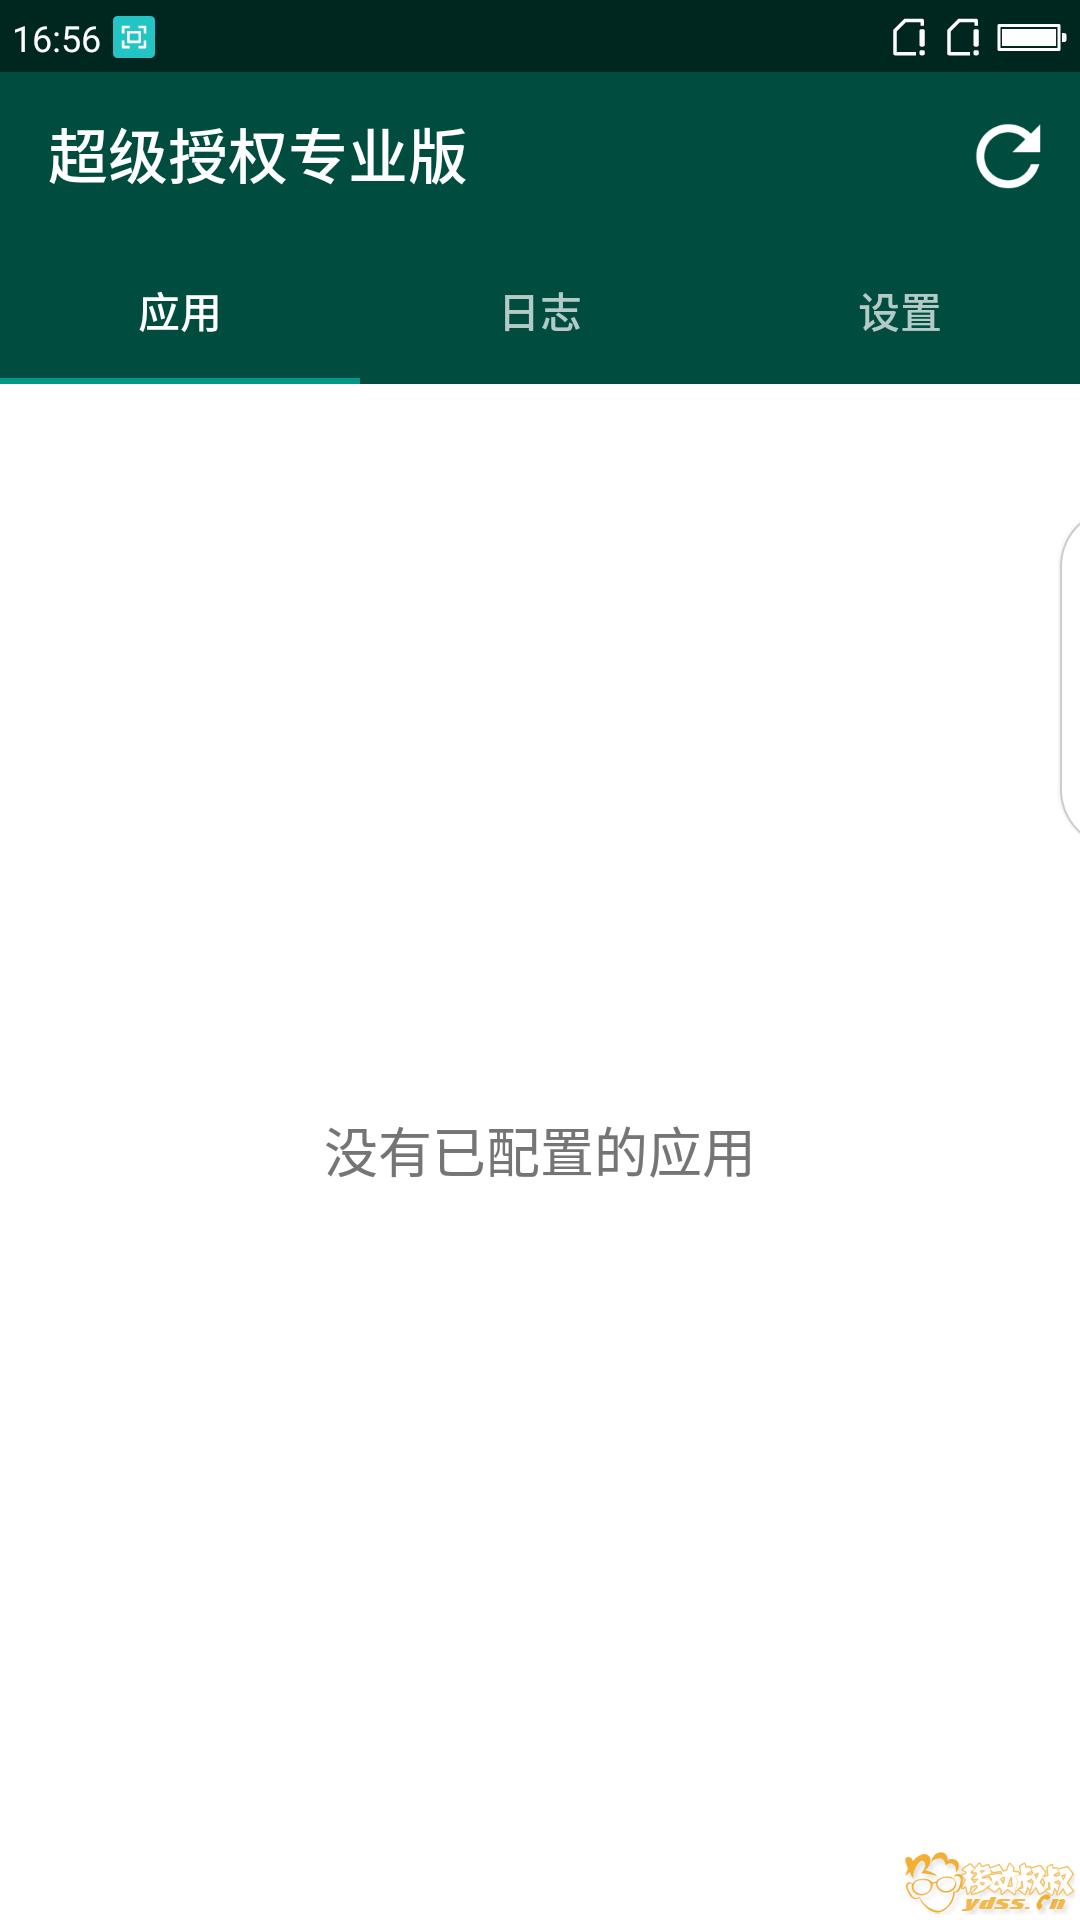 Screenshot_2017-12-02-16-56-02.png